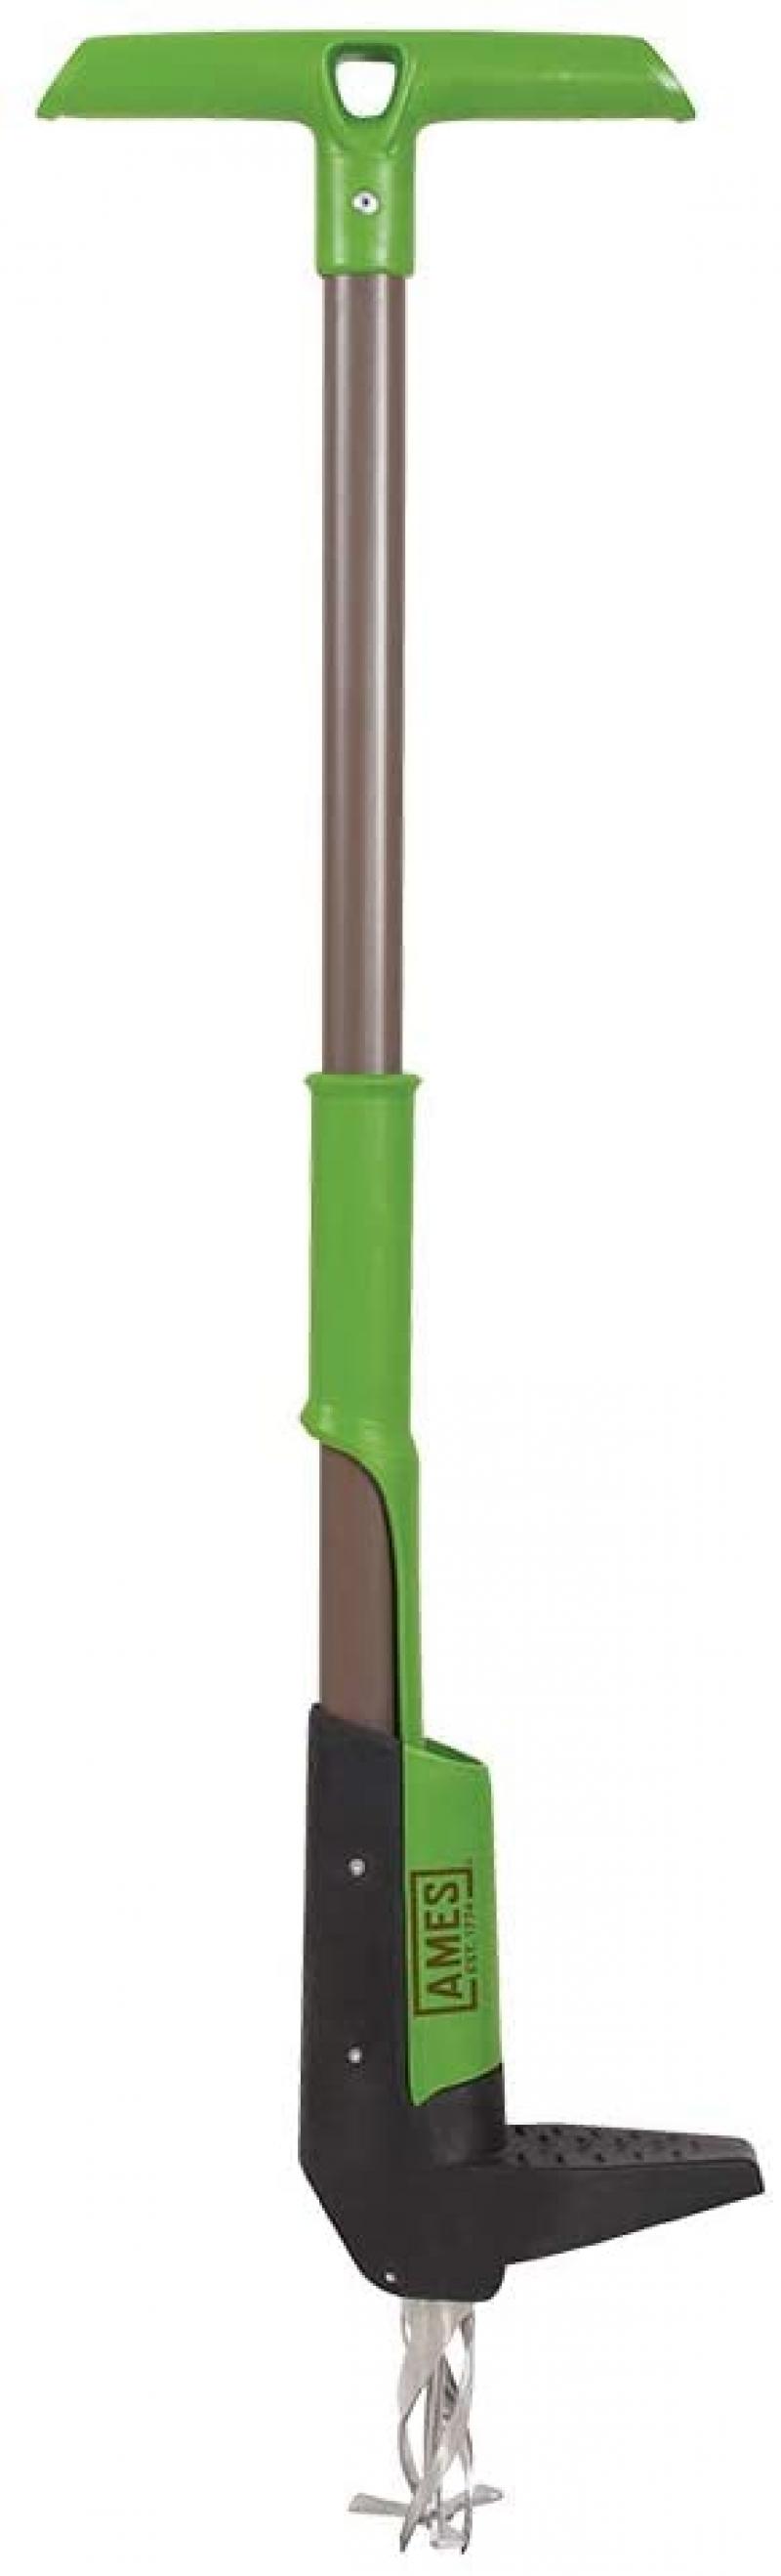 ihocon: AMES 2917300 Steel Stand Up Weeder, 40-Inch 除野草機